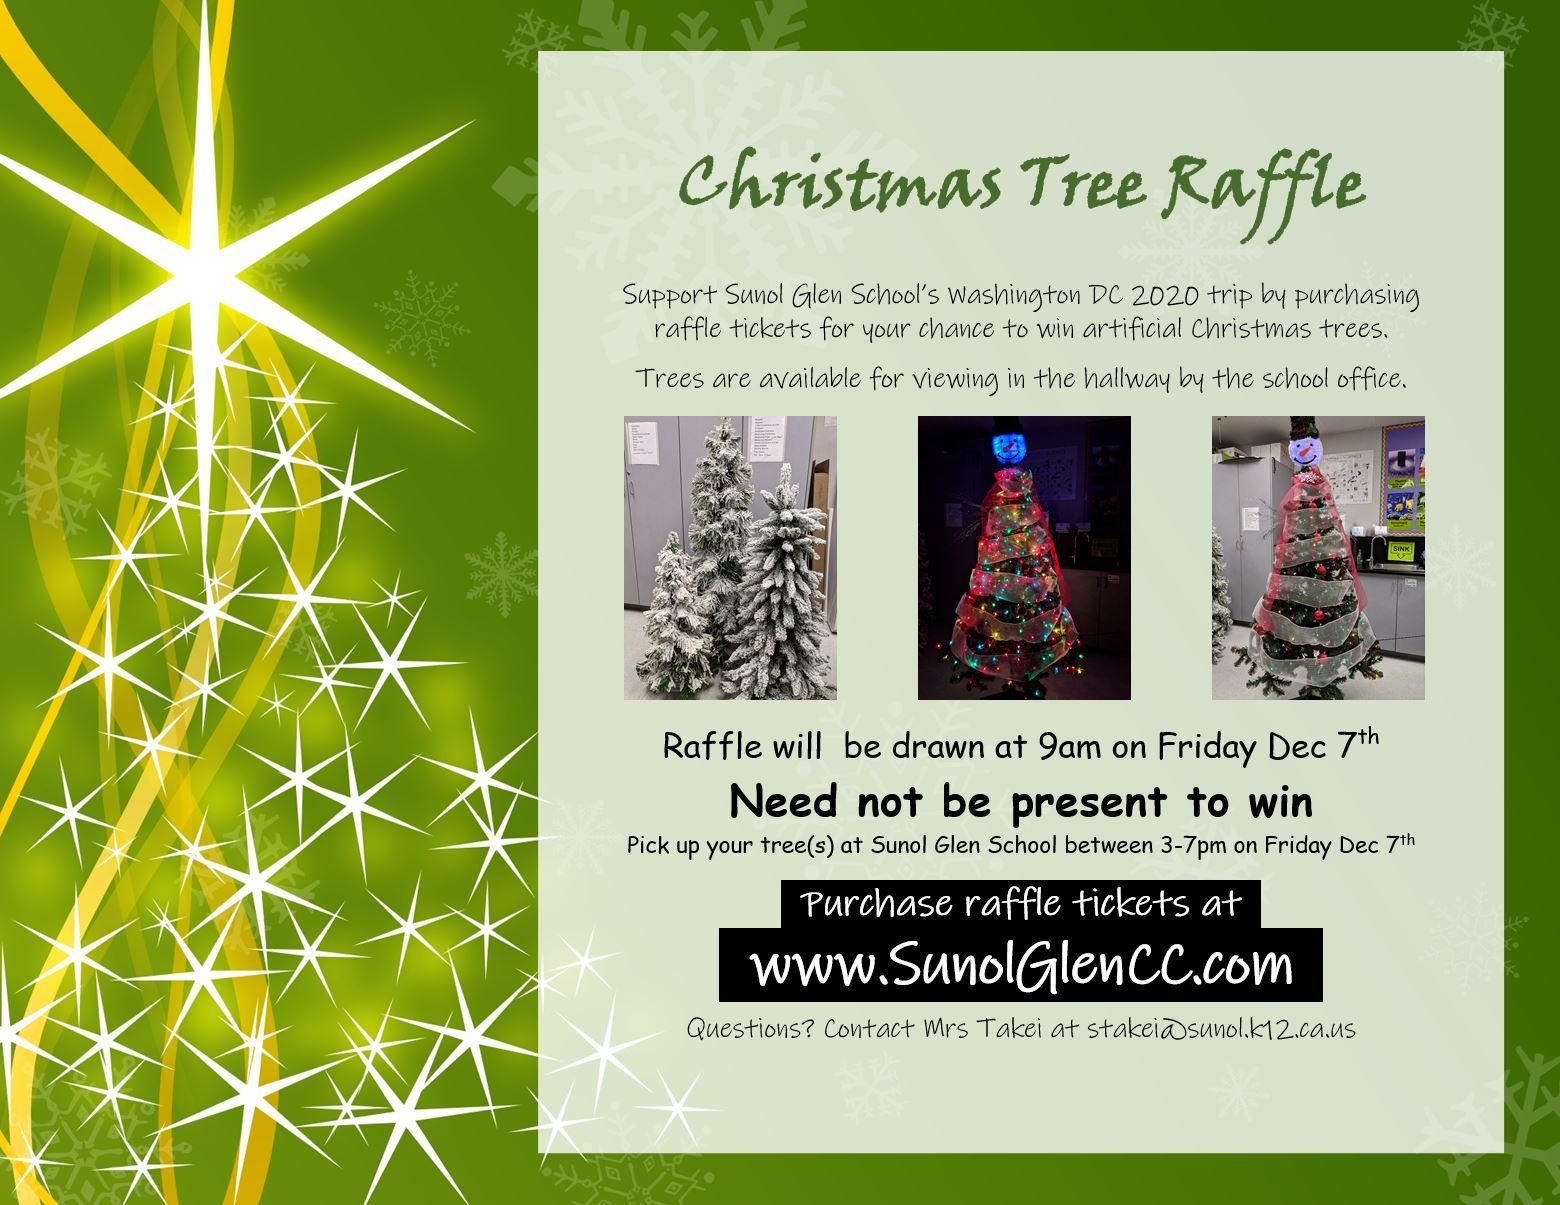 Christmas Tree Raffle 2018 - Washington DC 2020 Fundraiser - Sunol